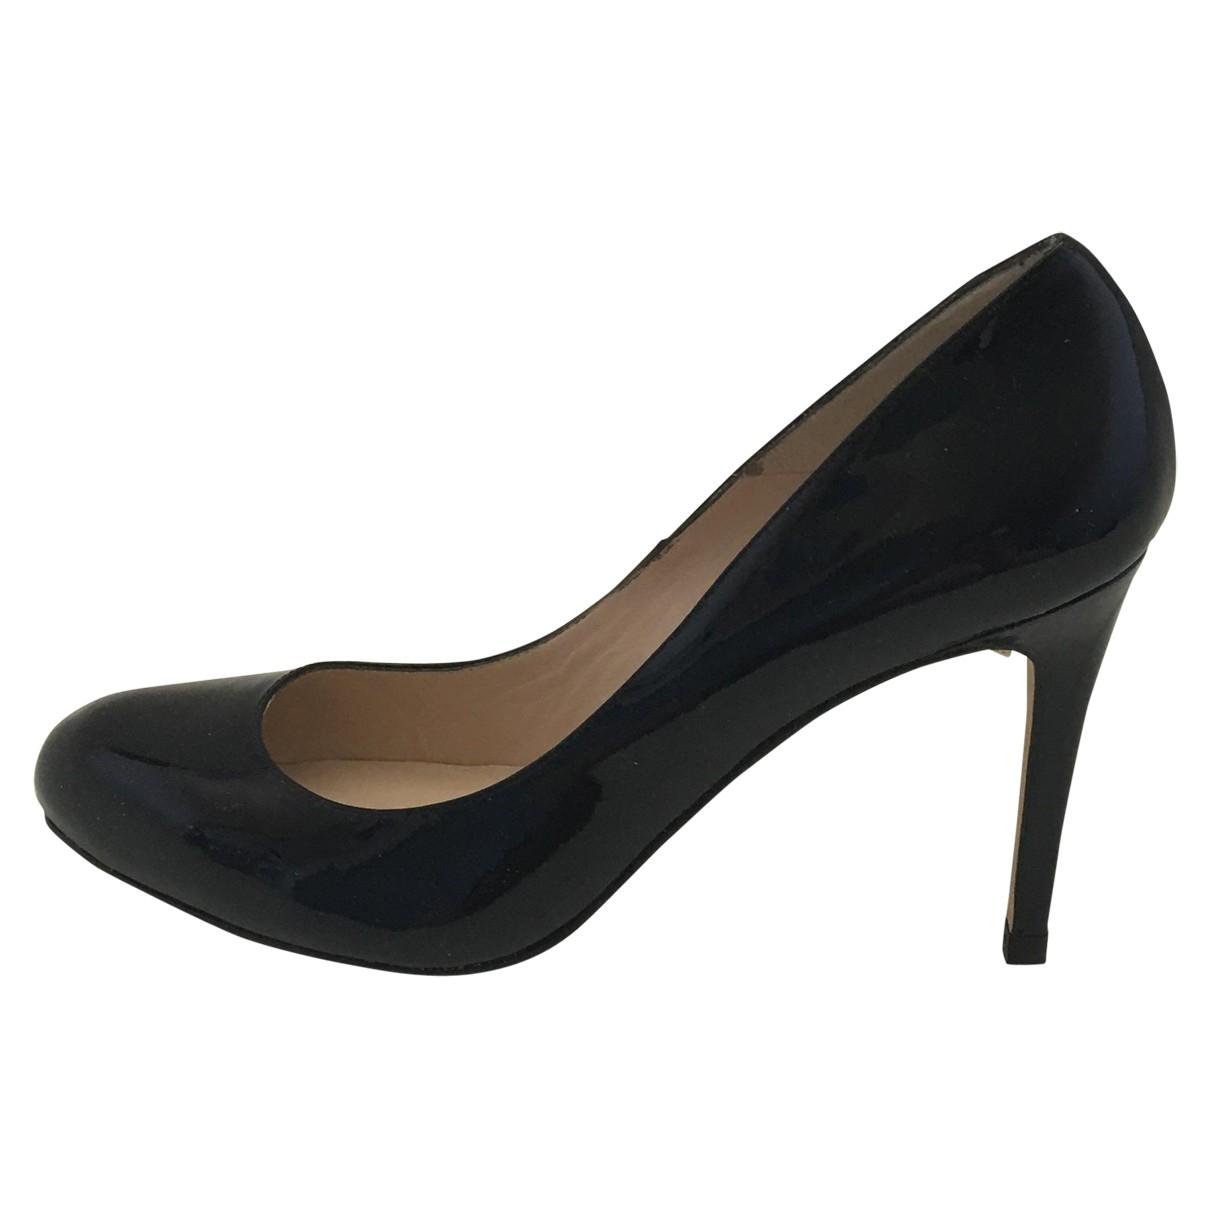 Lk Bennett \N Black Patent leather Heels for Women 41 EU